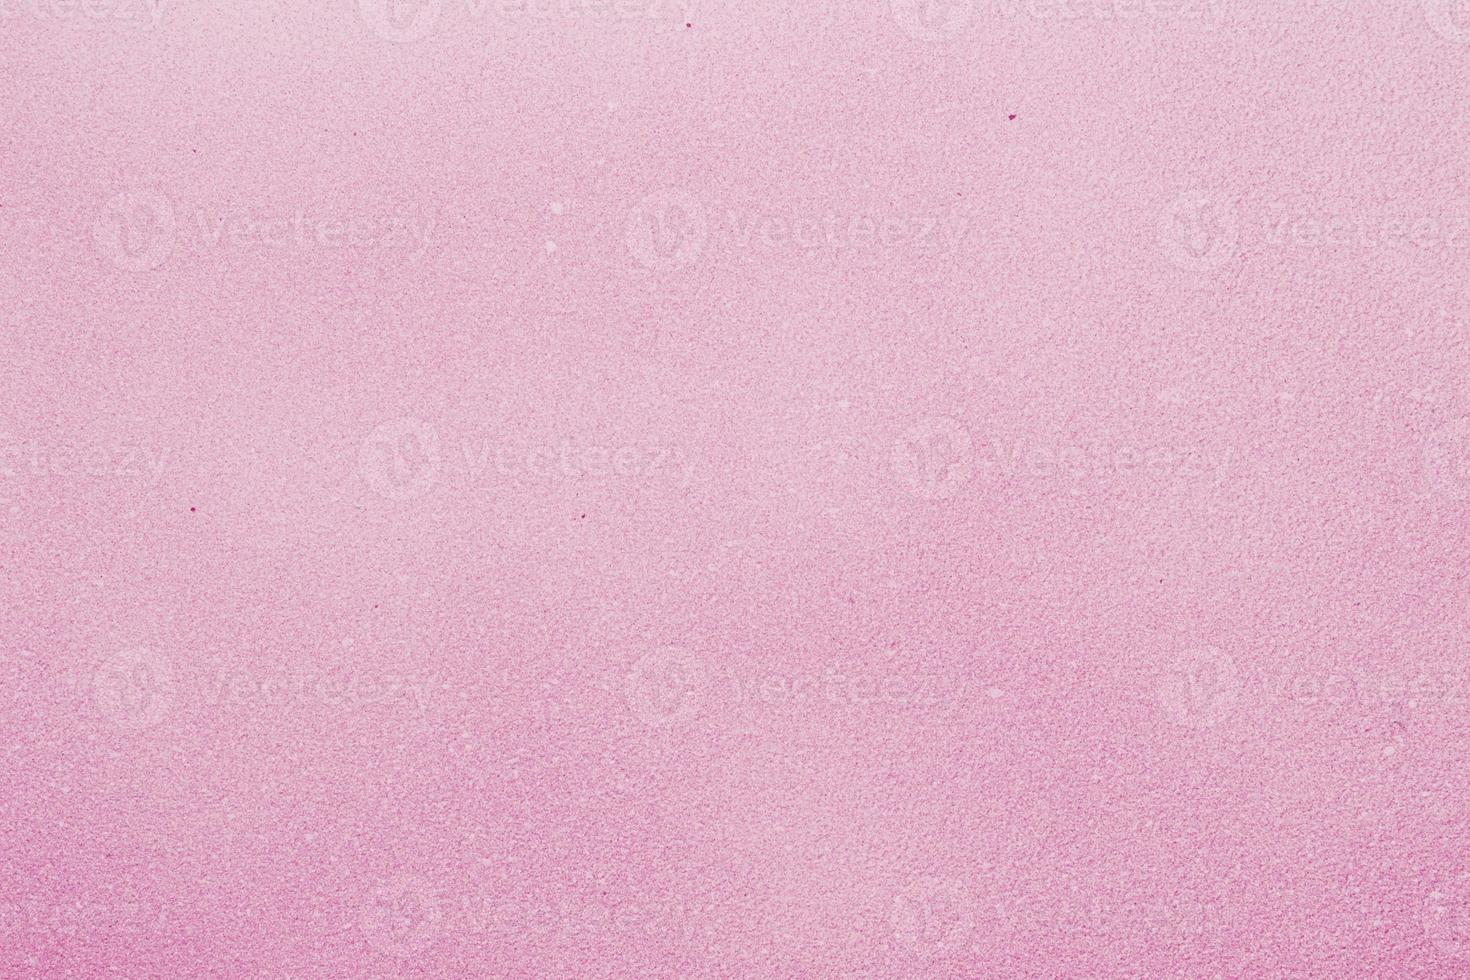 tom monokromatisk rosa konsistens foto